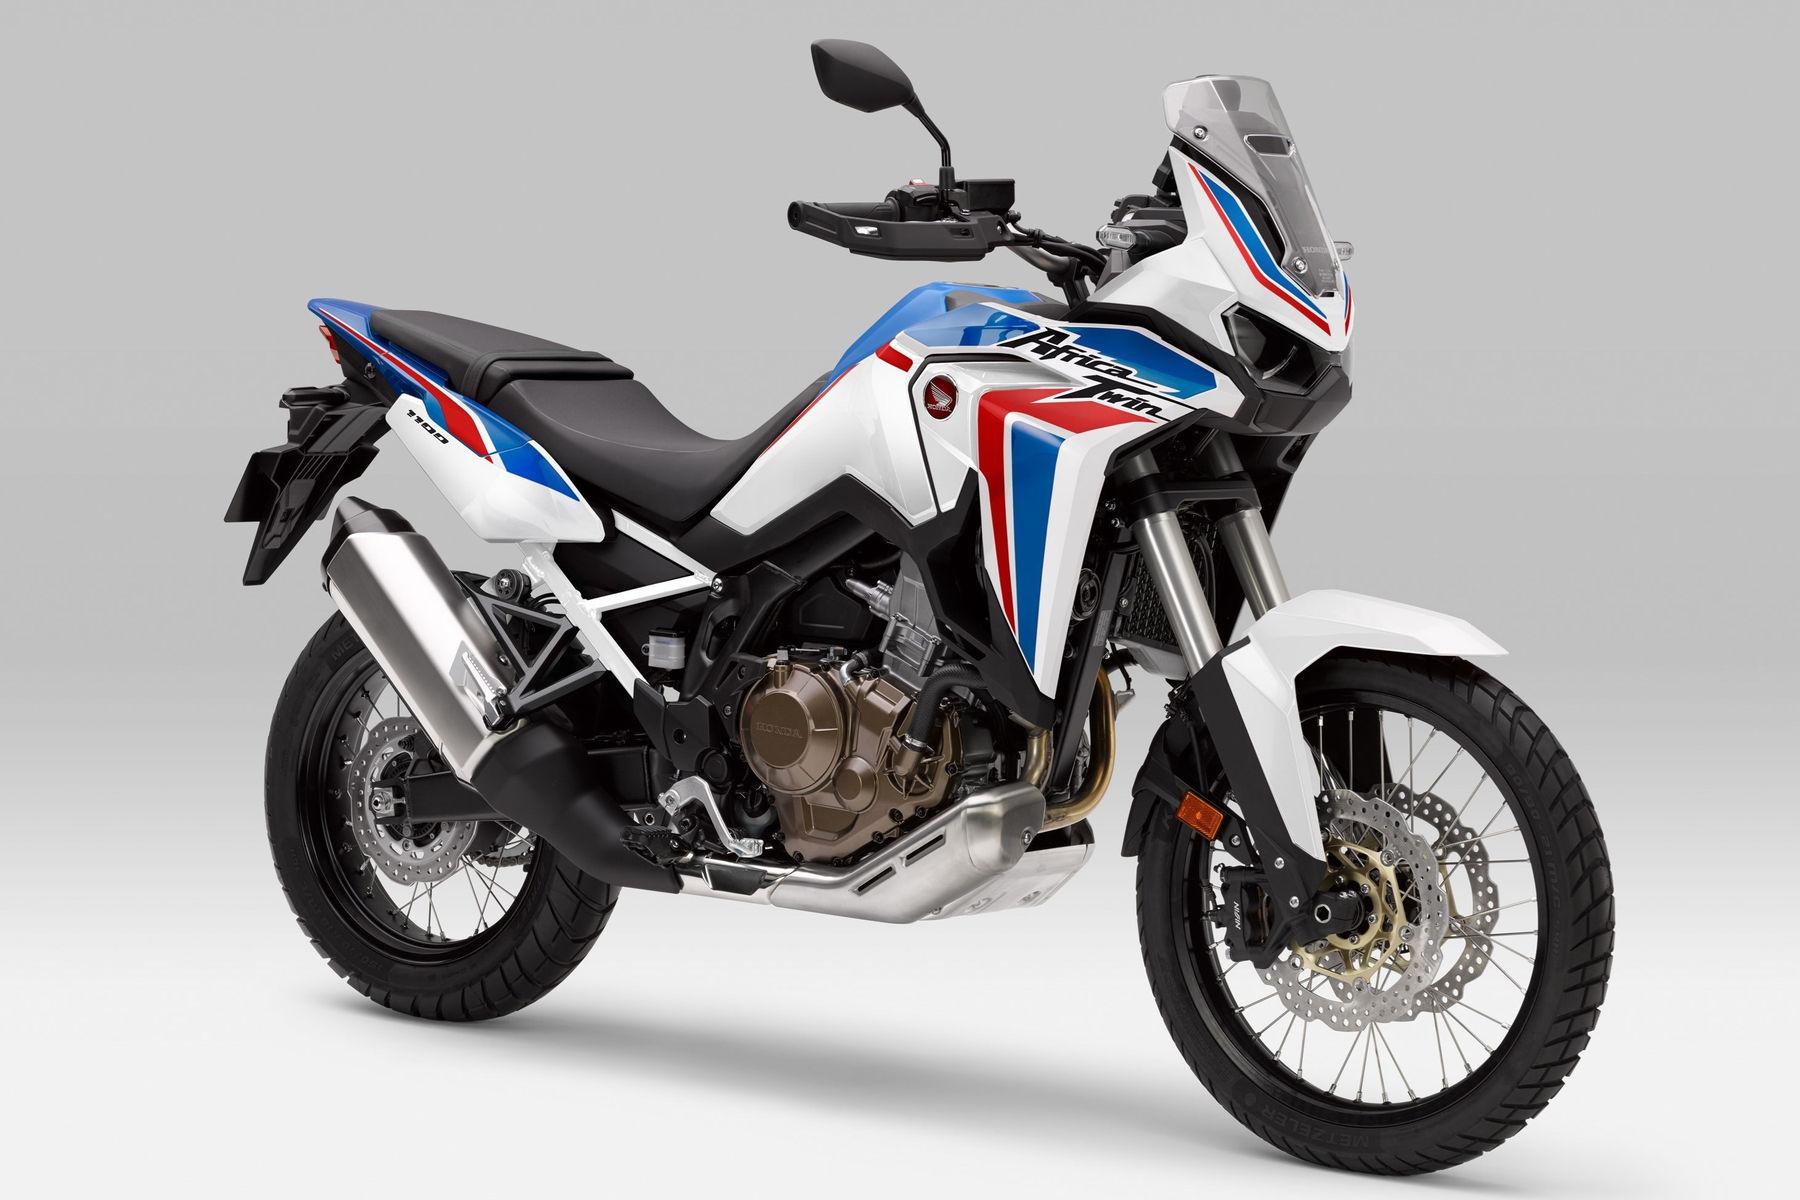 2021 honda crf1000l africa twin